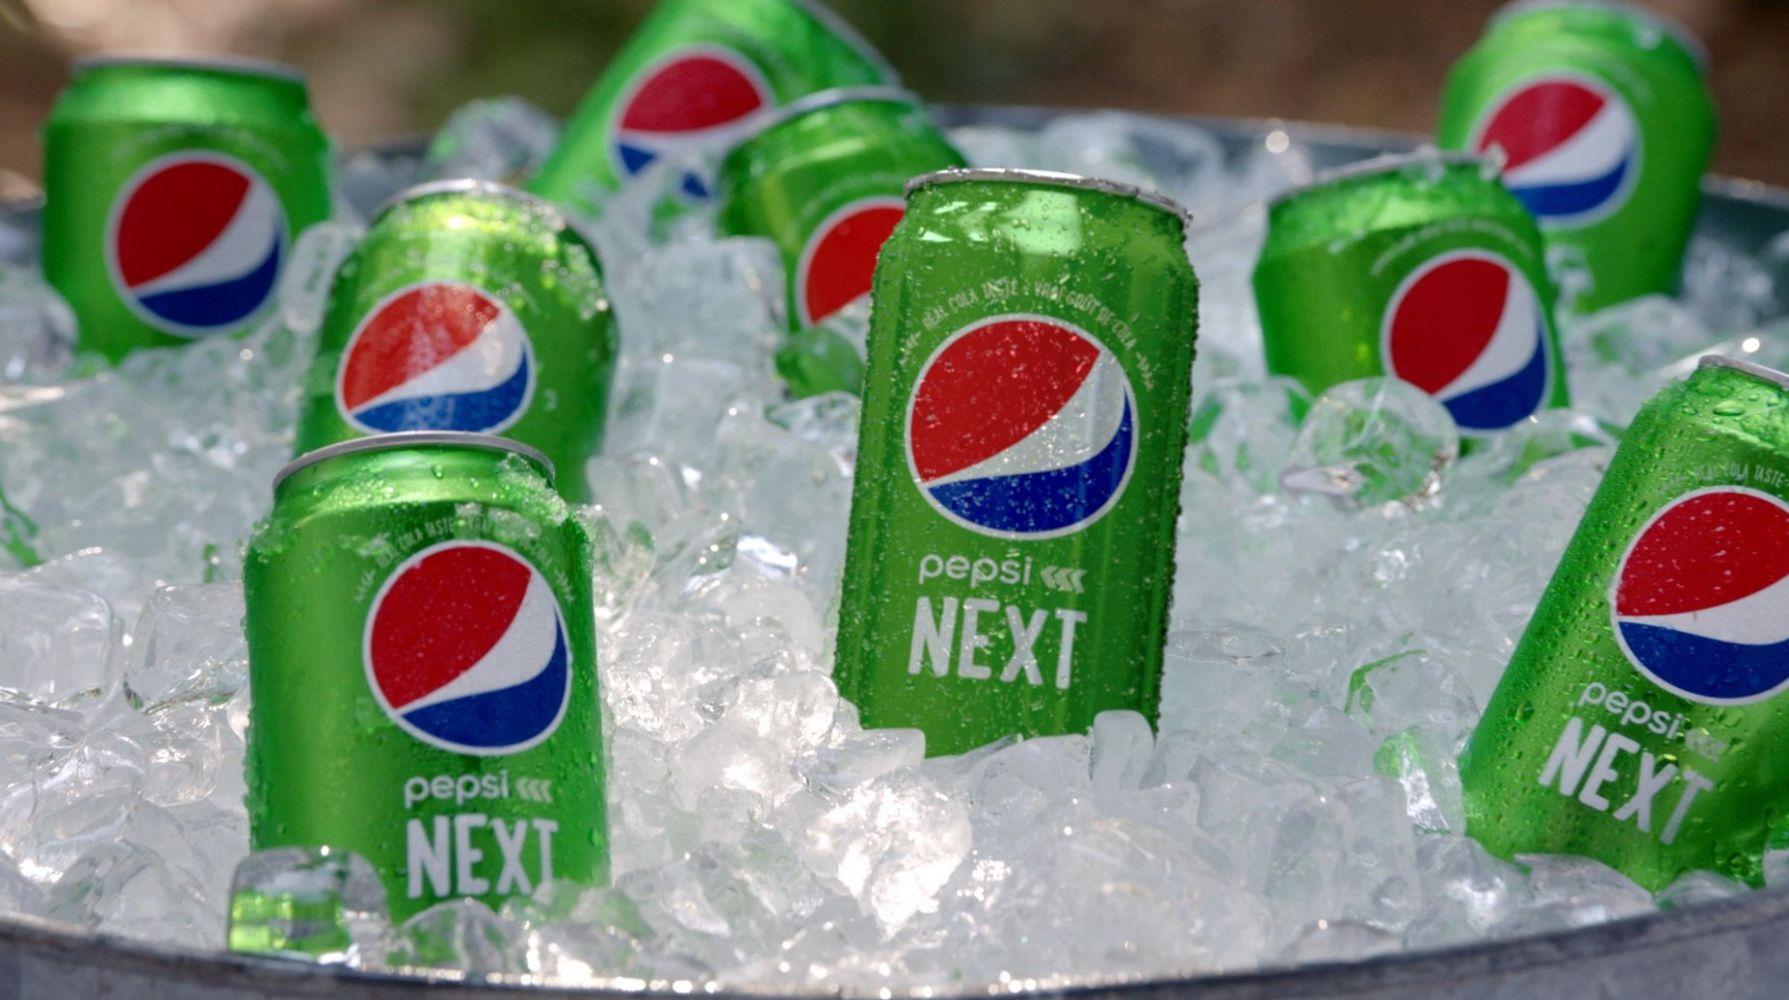 логотипы пепси за все время фото материала зависит